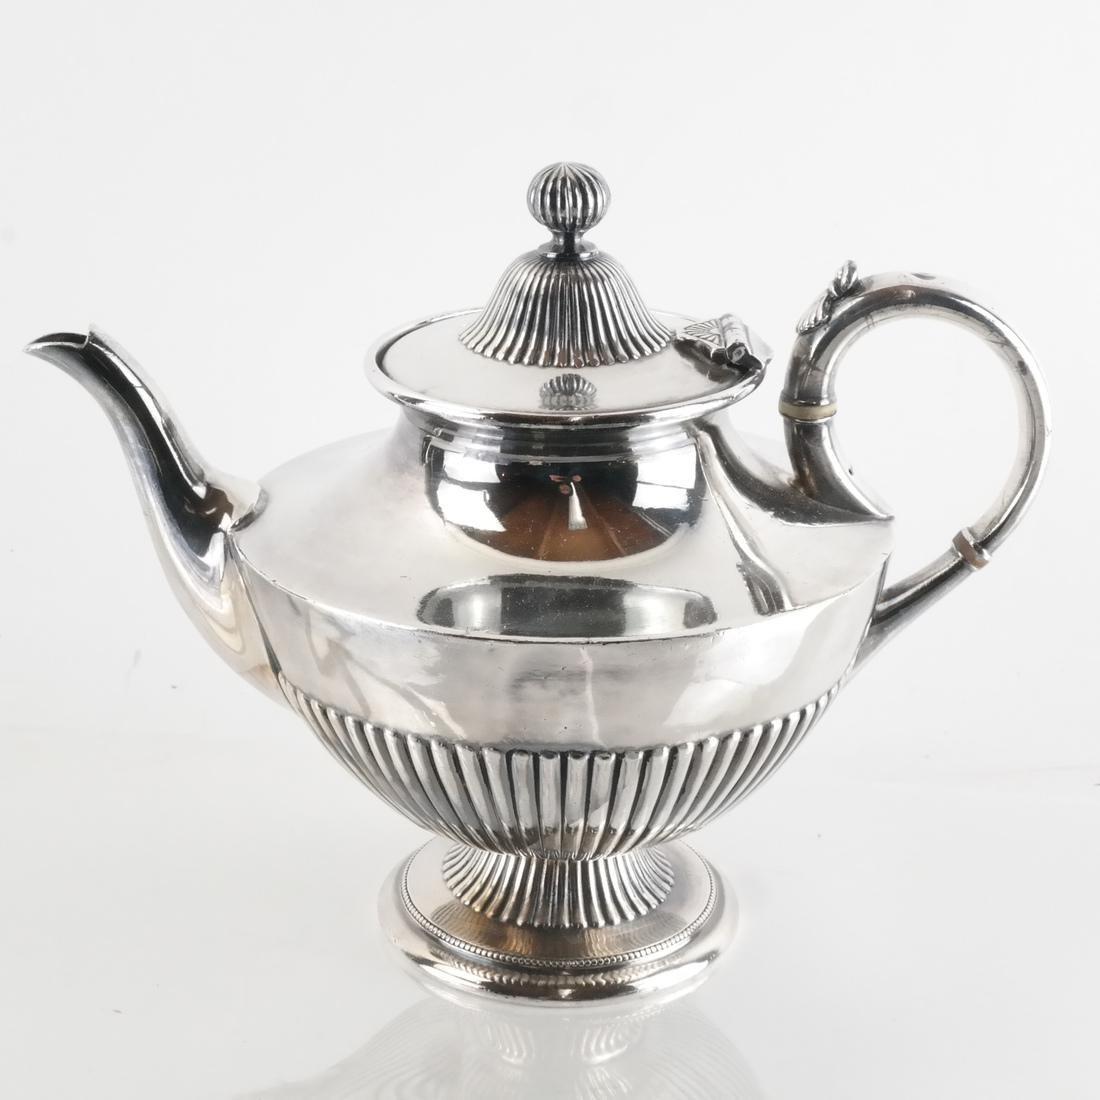 James Dixon & Sons, Silver Plate Tea Service - 2